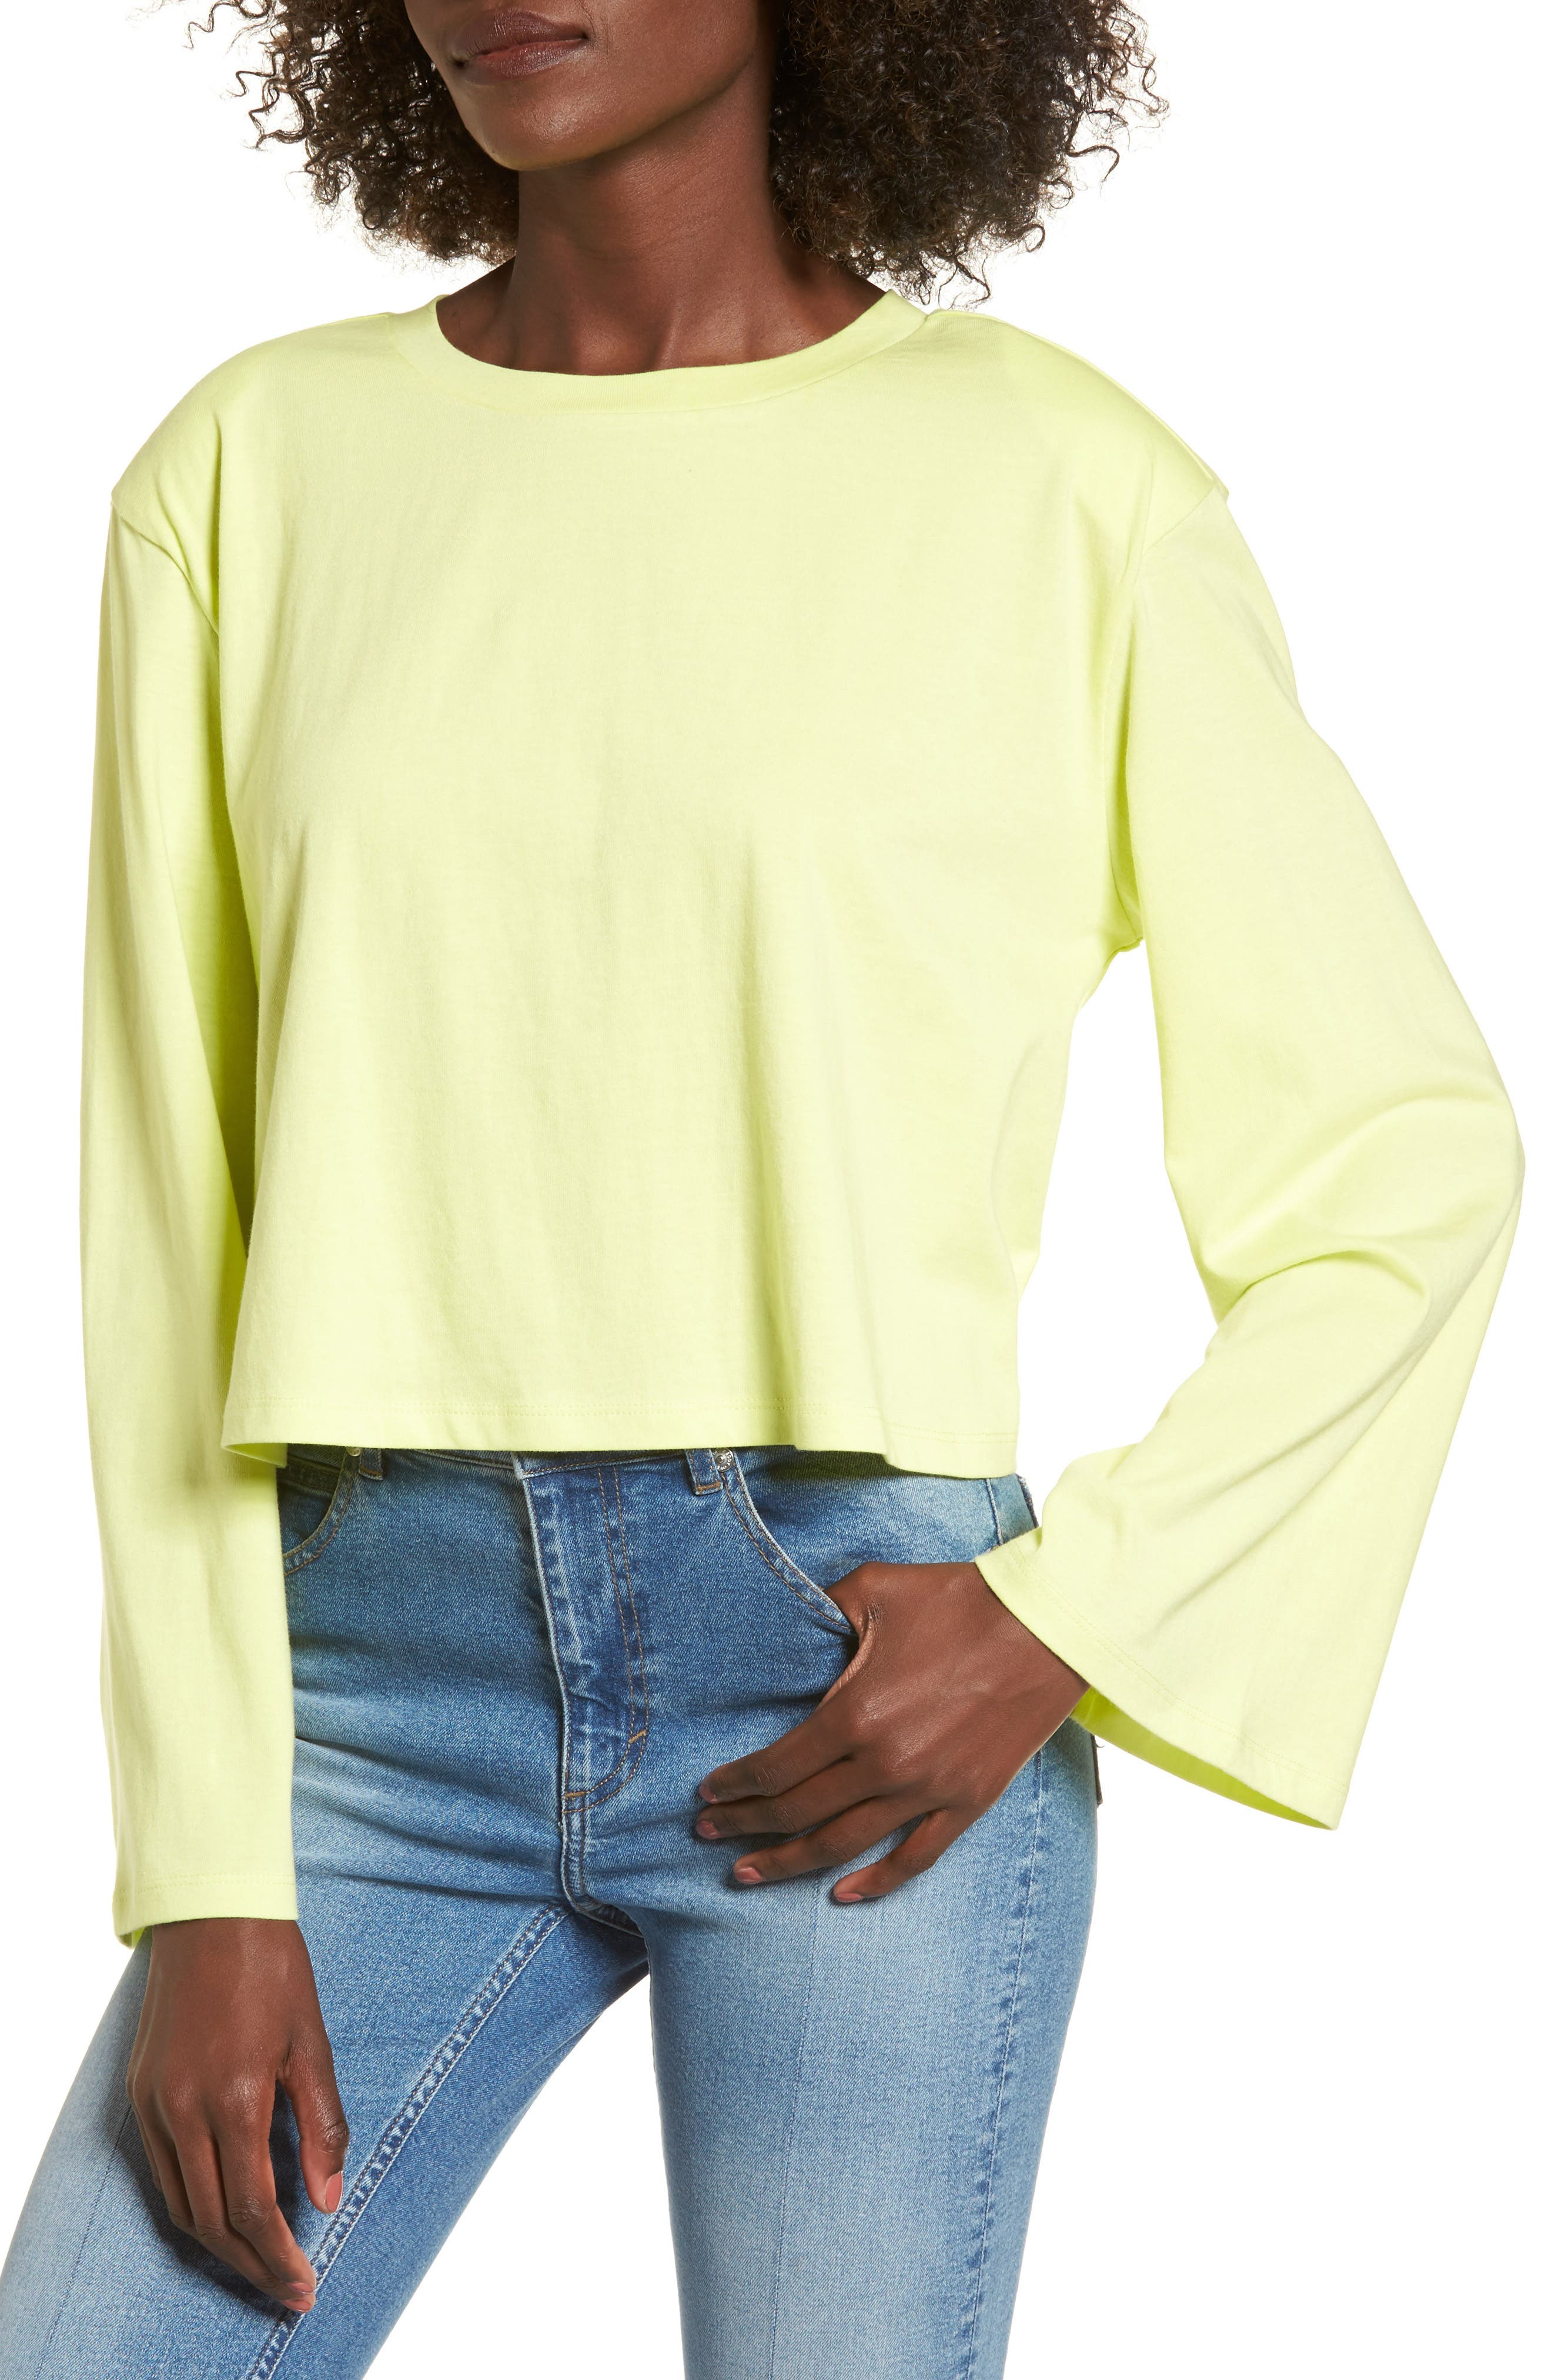 Shoulder Pad Tee,                         Main,                         color, 330